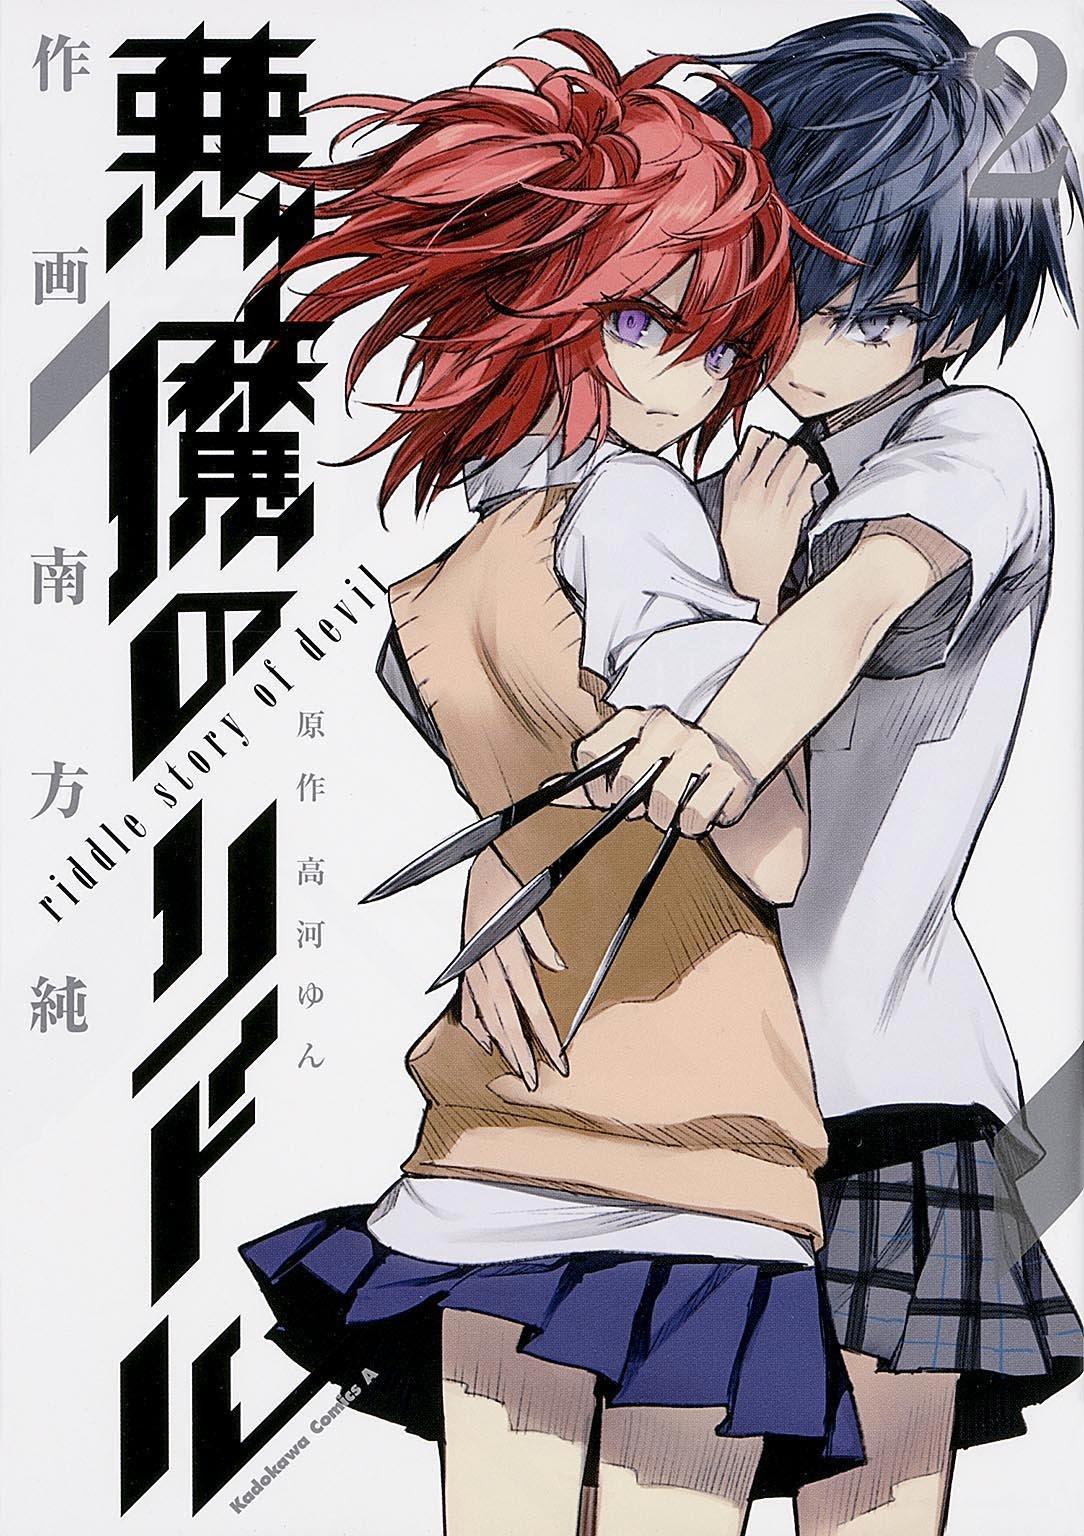 Download Akuma no Riddle [Devil Riddle] - Vol.2 (Kadokawa Comics Ace) Manga PDF